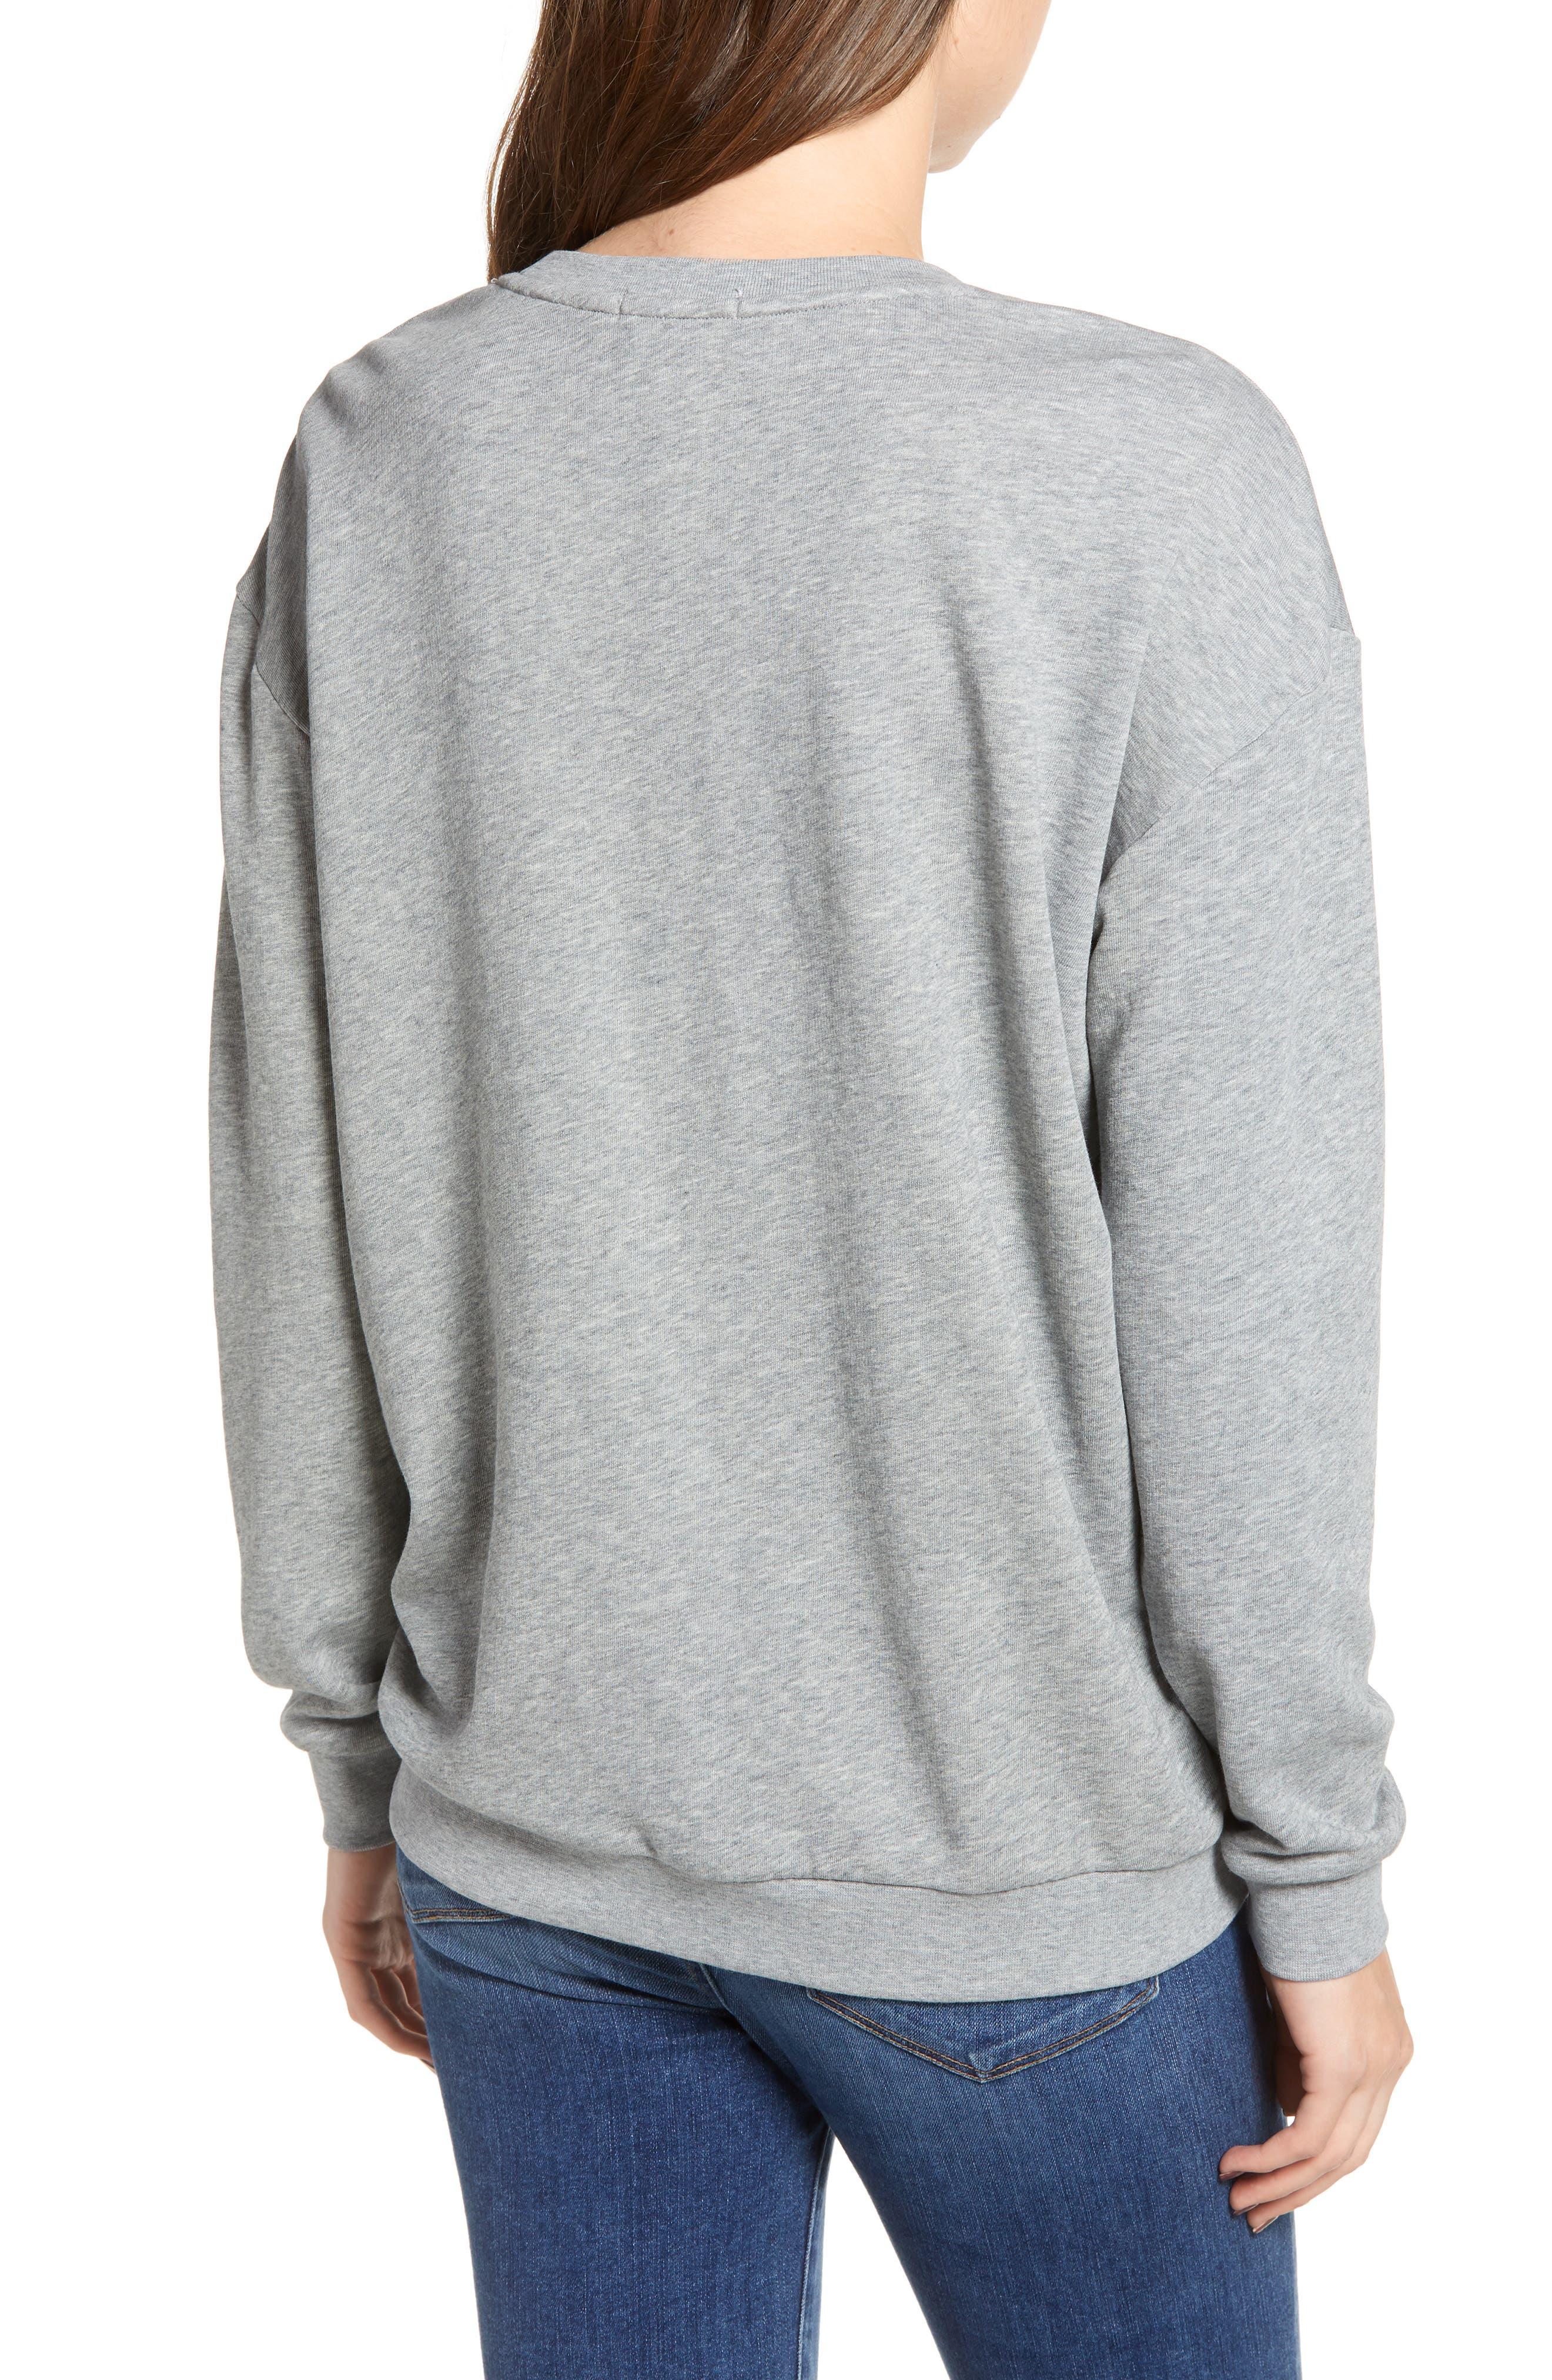 Alexa Stars Sweatshirt,                             Alternate thumbnail 2, color,                             GREY